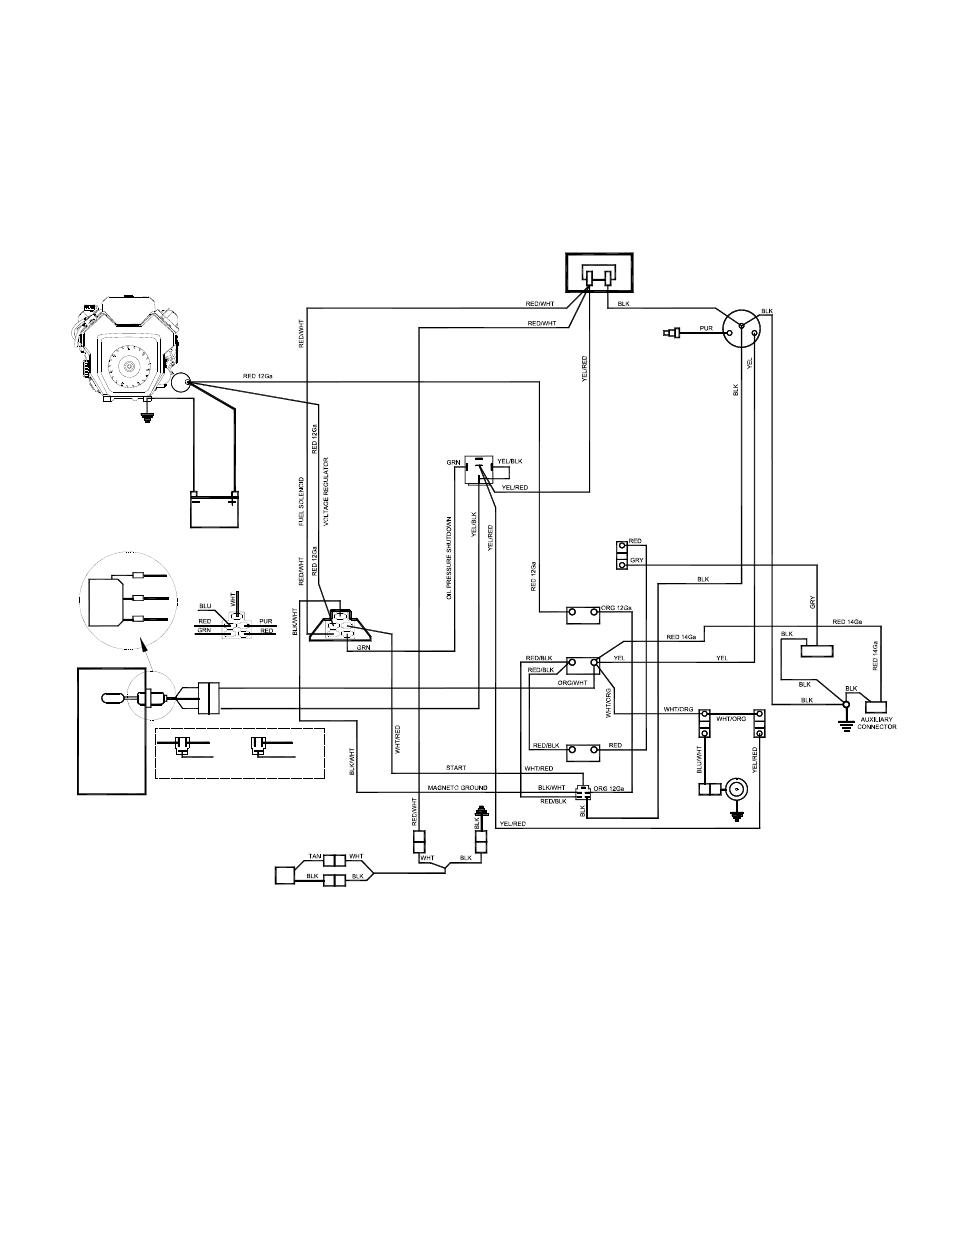 Saflok Wiring Diagram 2000 F150 Wire Harness Harley Fxr